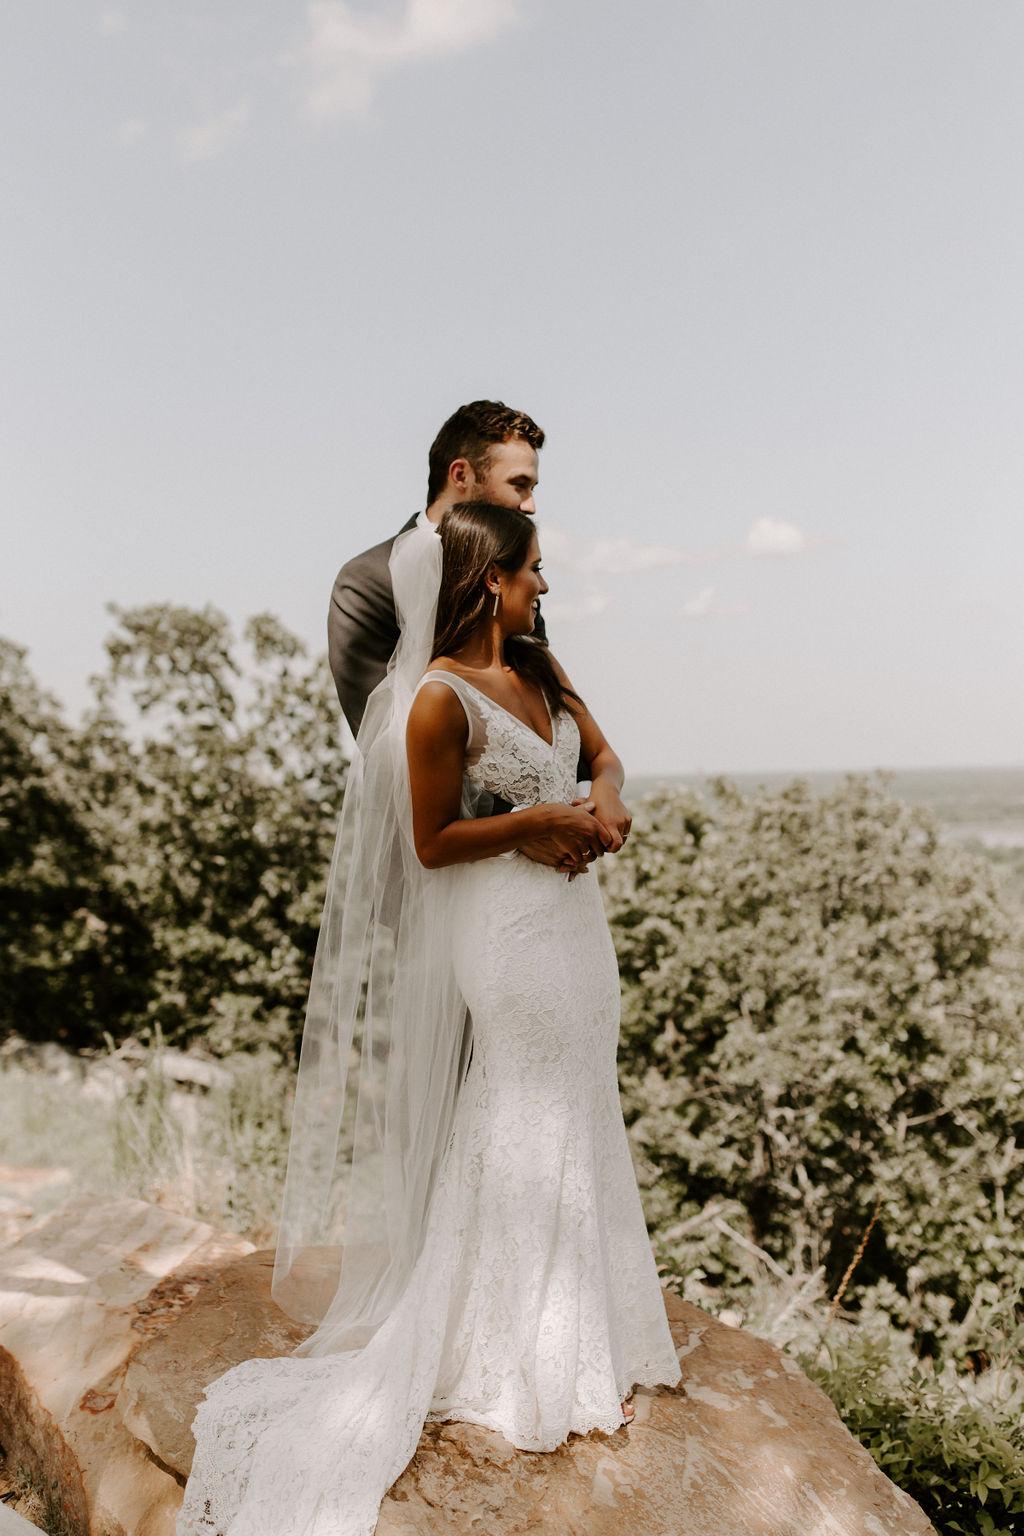 Tulsa White Barn Wedding Venue Outdoor Ceremony 47.jpg